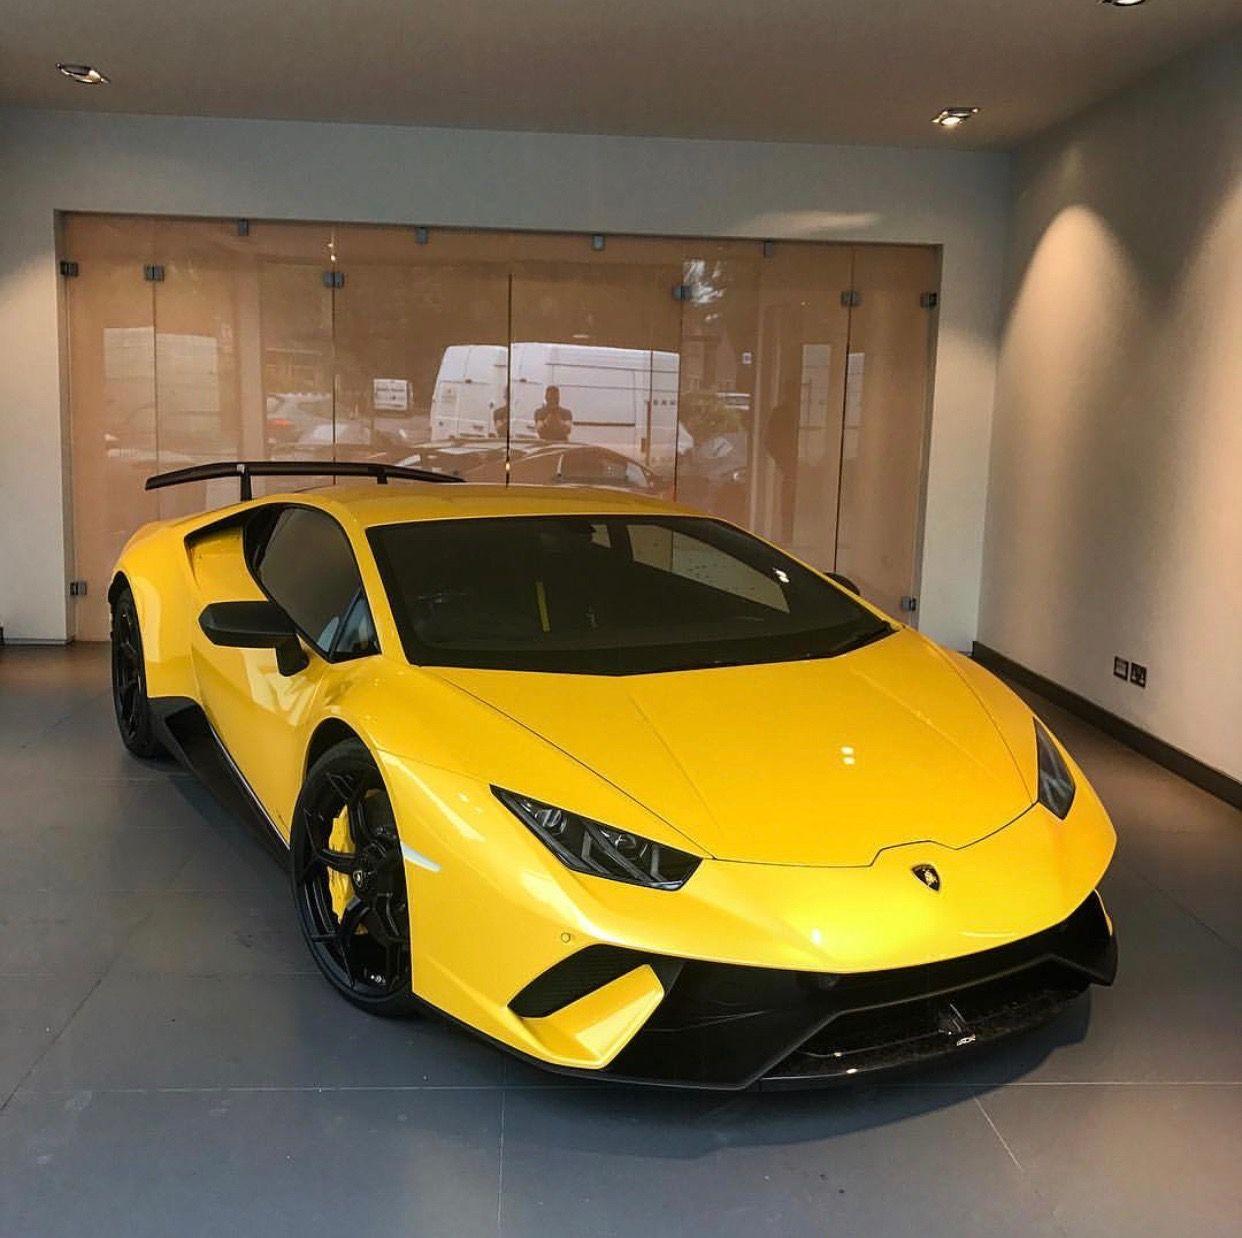 Lamborghini Huracan Performante Painted In Giallo Photo